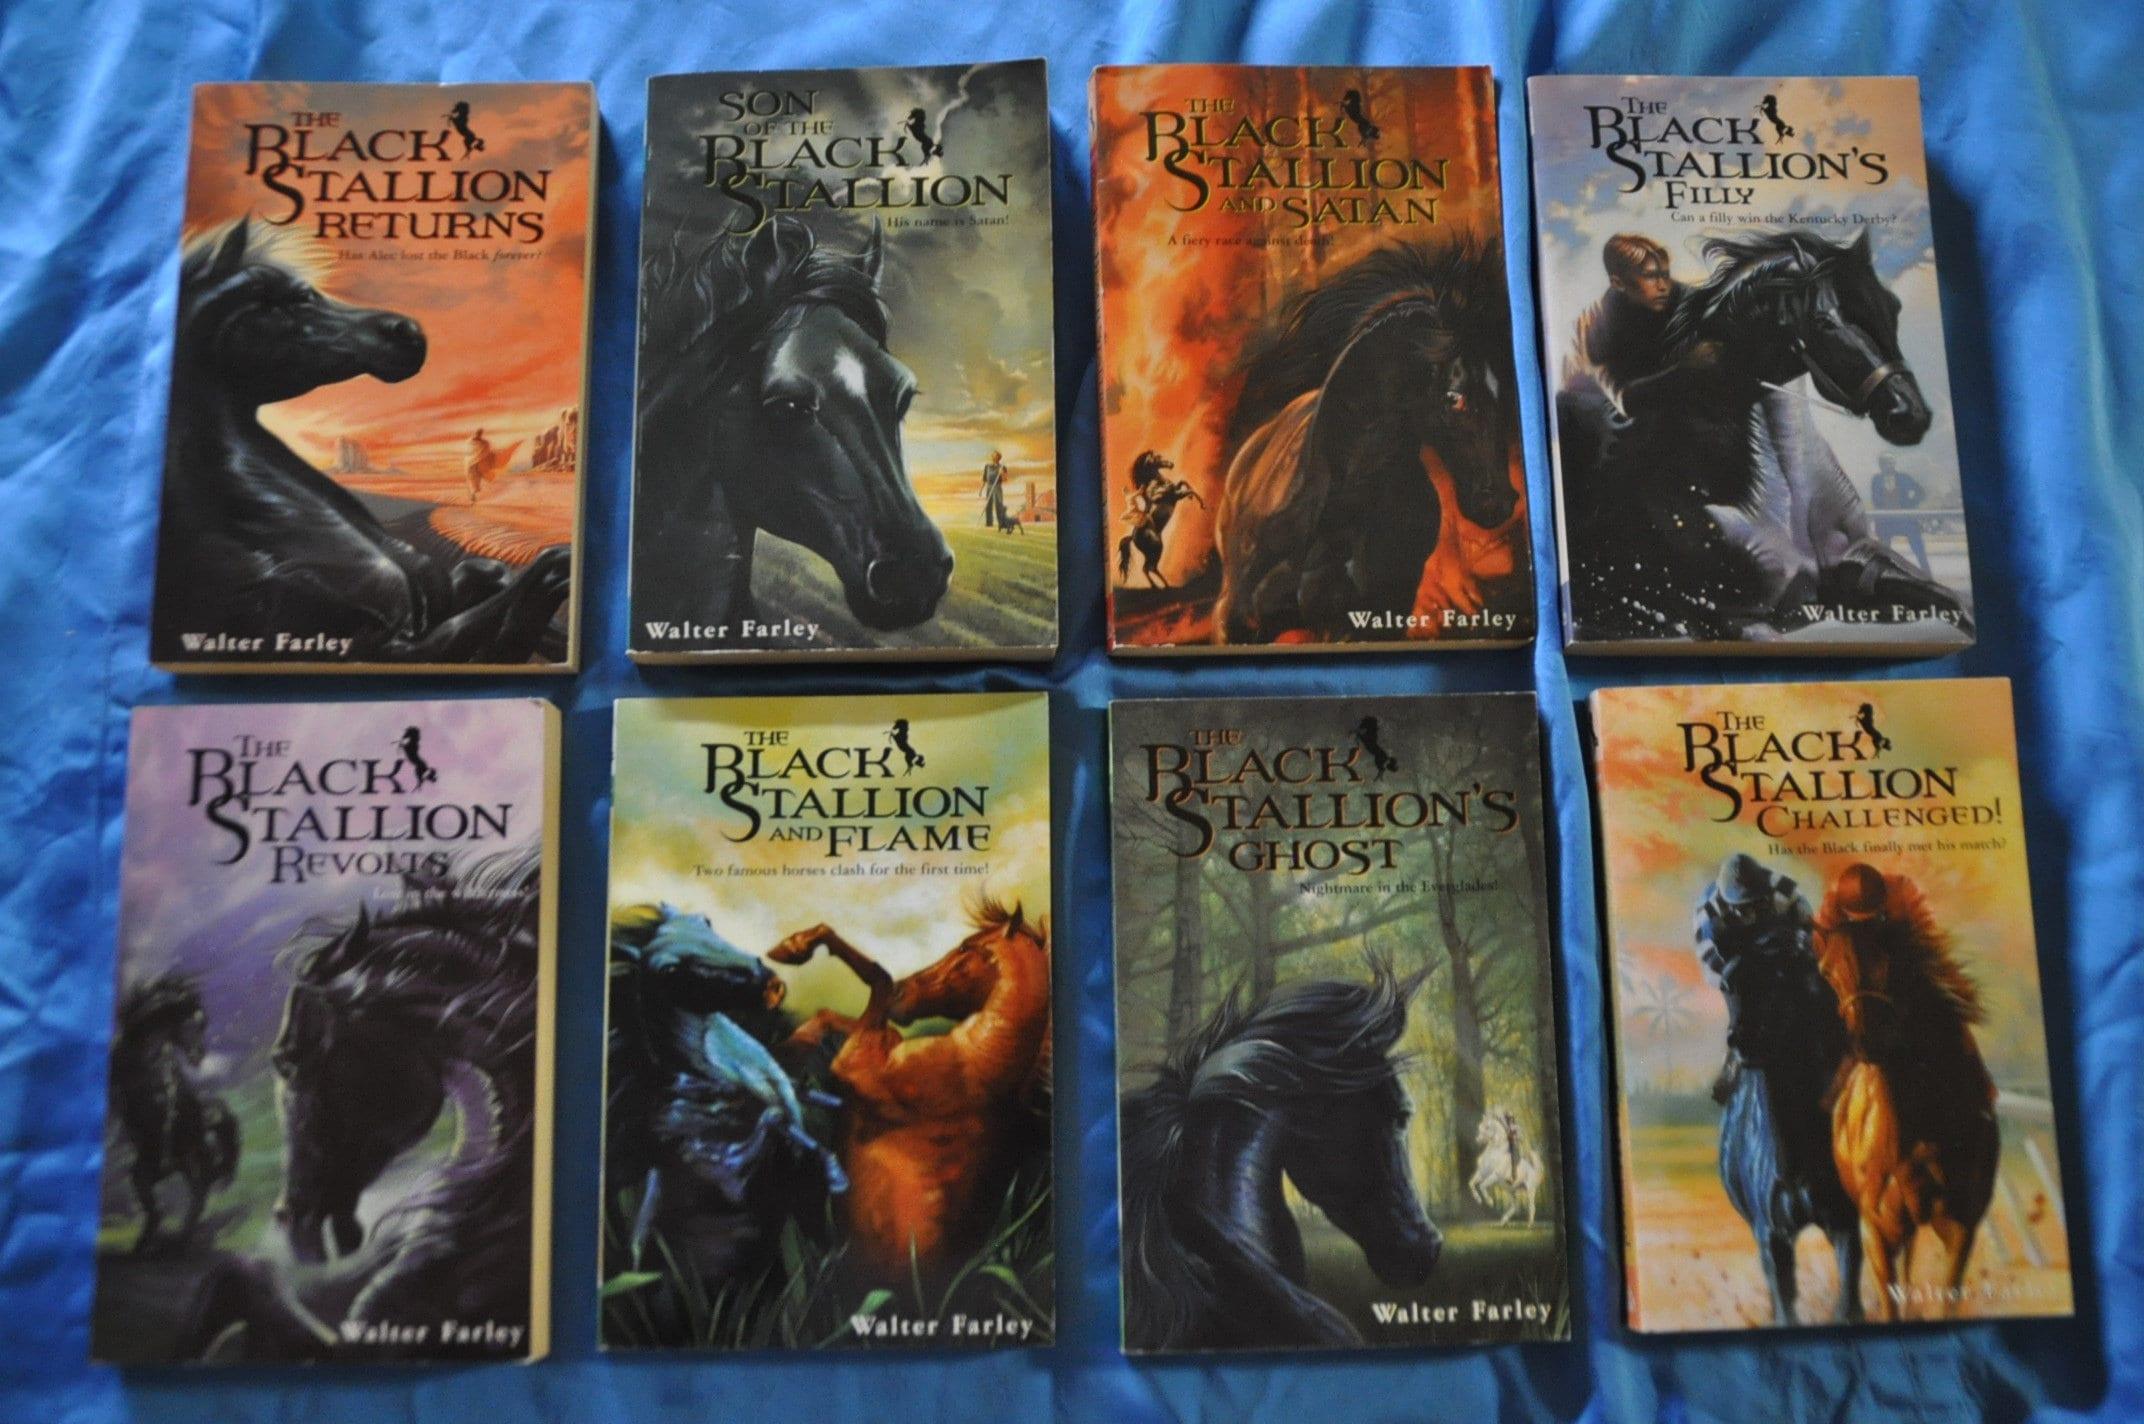 The Black Stallion Book